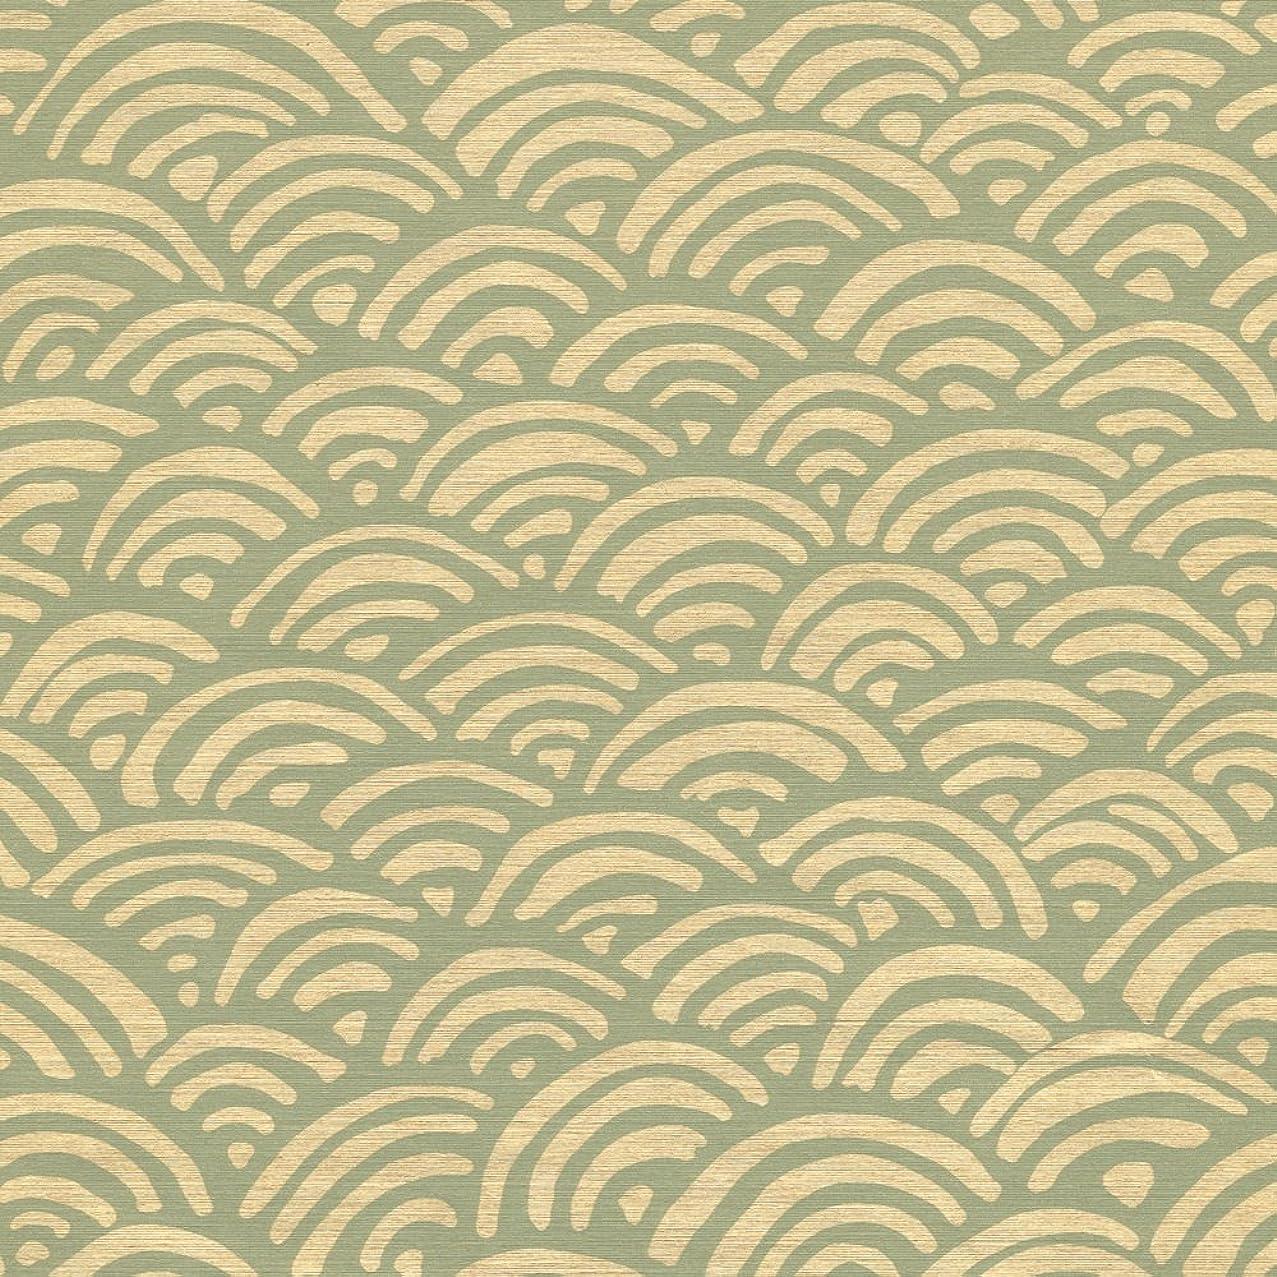 Caspari 89463RSC Lulu's Rainbow Aqua And Pale Gold roll of gift wrap, Green